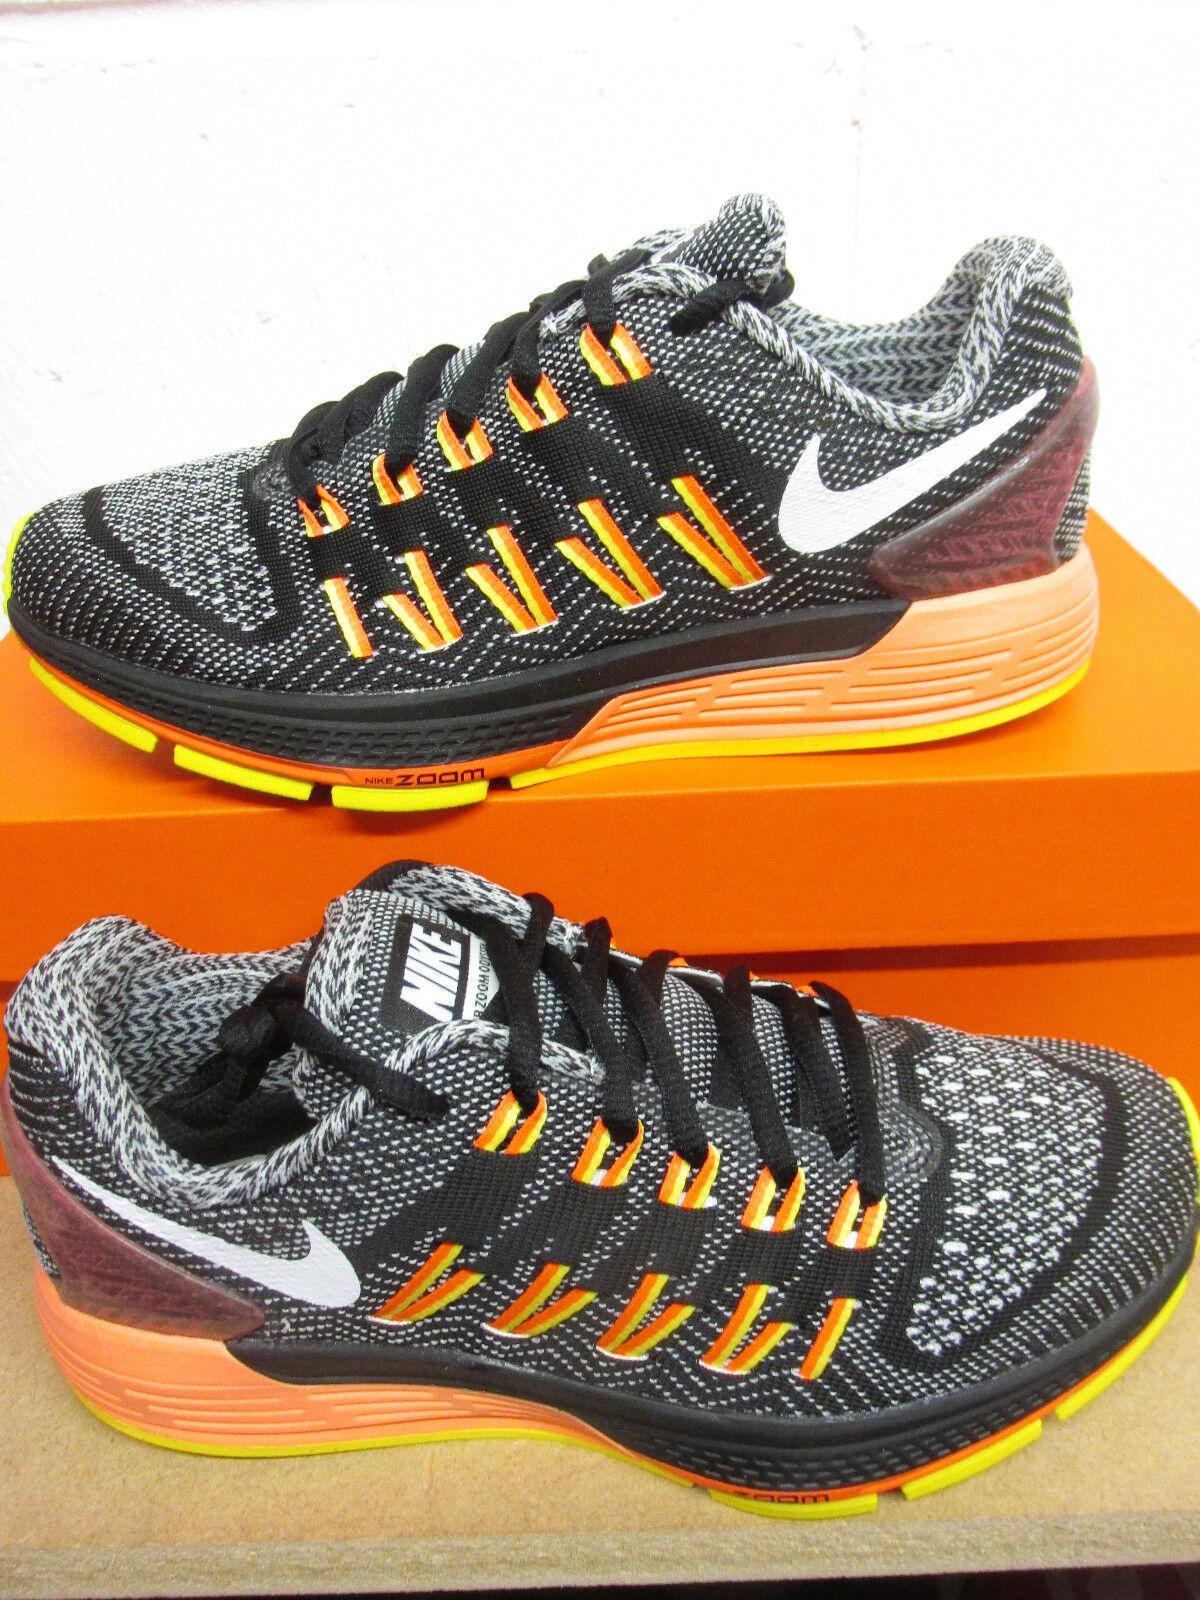 Nike damen Air Zoom Odyssey Running Trainers 749339 008 Turnschuhe schuhe